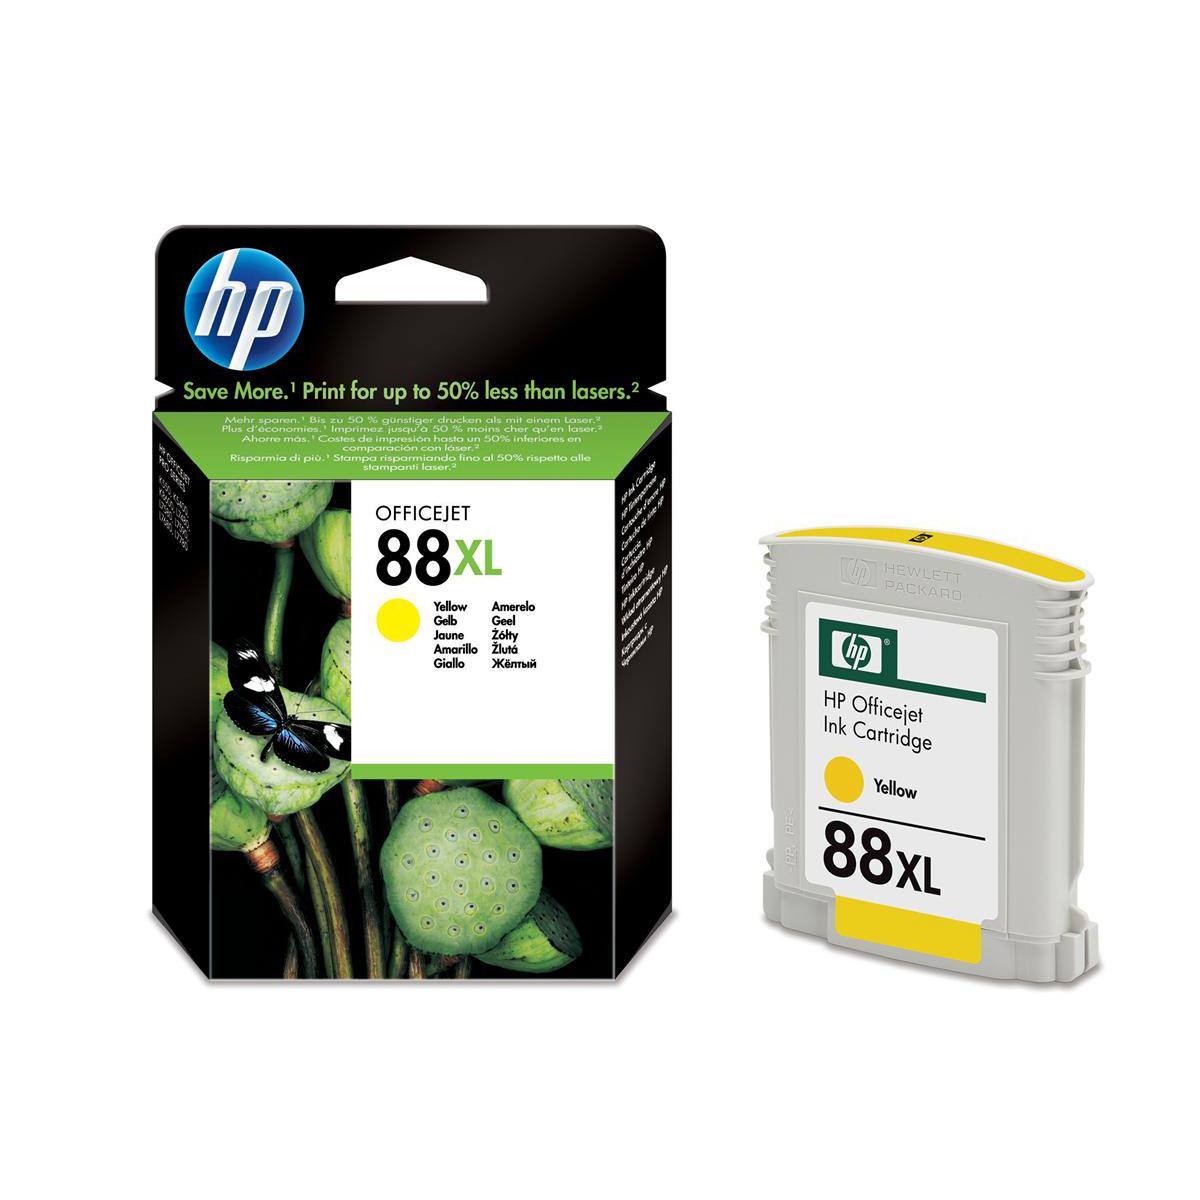 Hewlett Packard [HP] No.88XL Inkjet Cartridge Page Life 1540pp 17.1ml Yellow Ref C9393AE